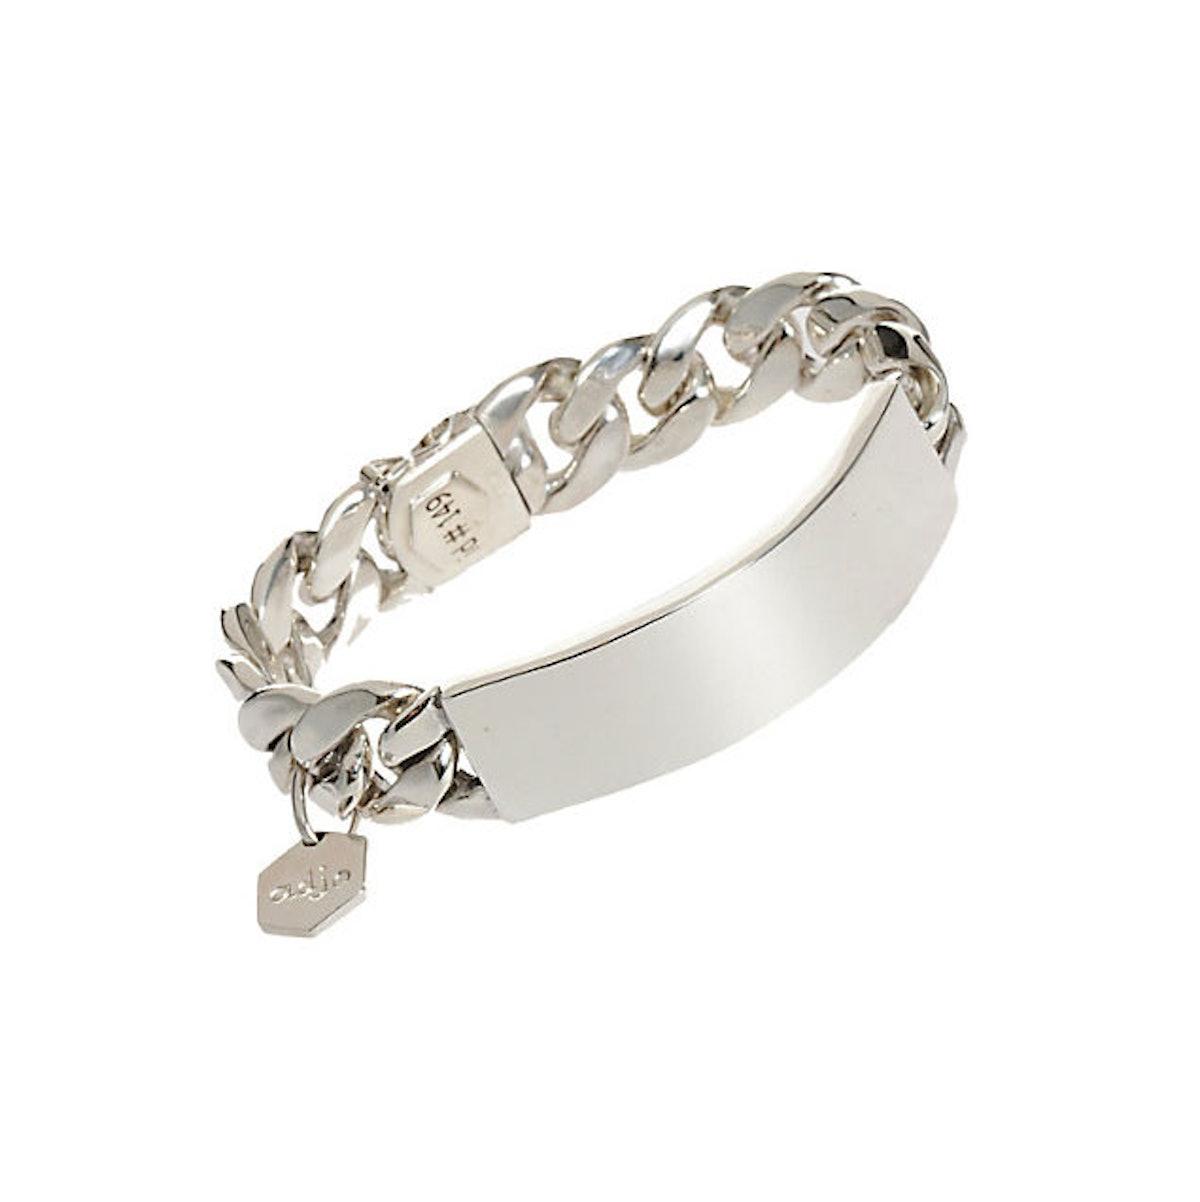 Ann Dexter Jones bracelet